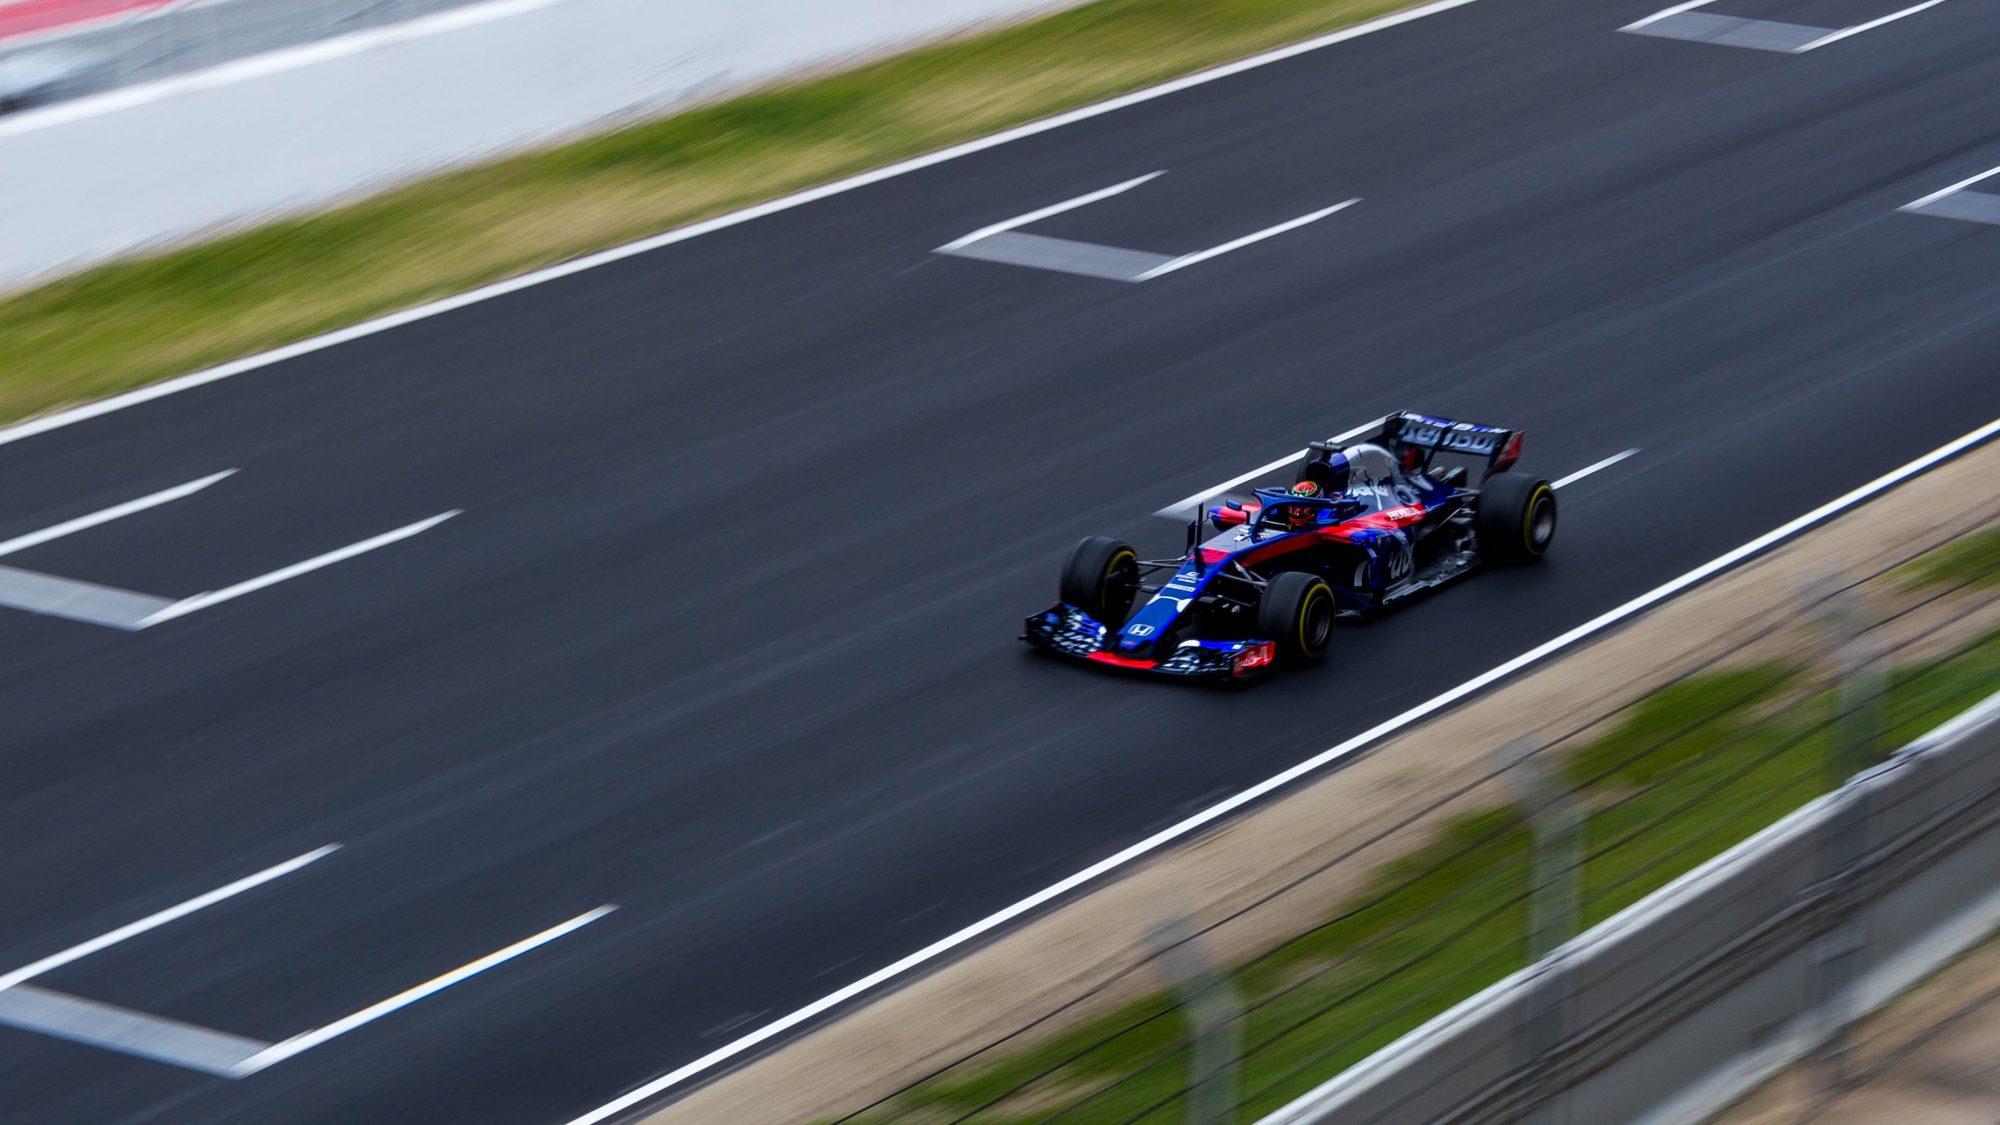 Watch Formula 1 live in Spain